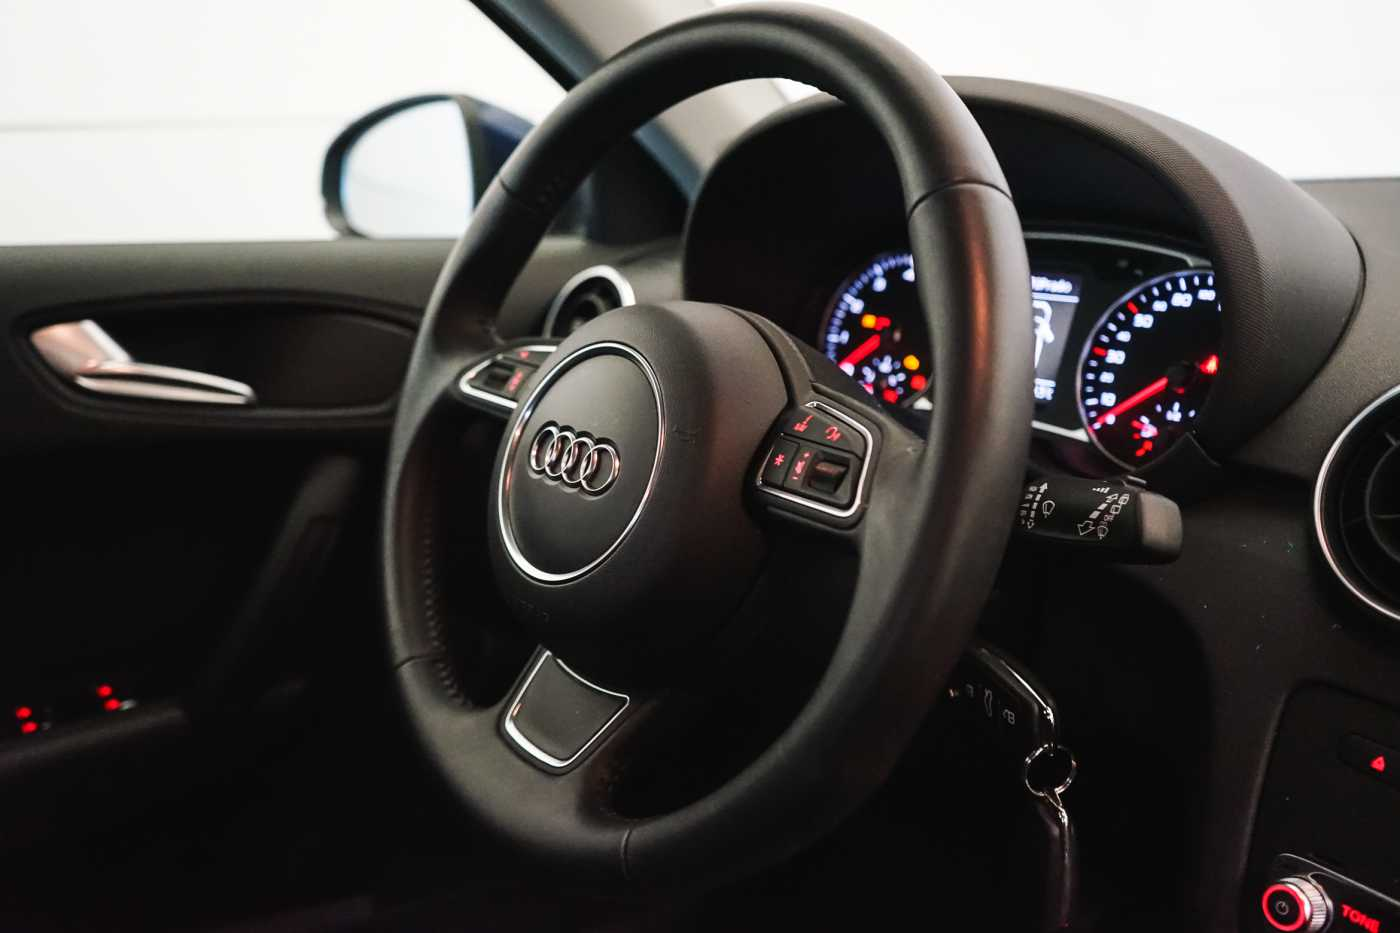 Audi A1 Proline Admired S-Line // Bluetooth, Zetelverwarming, Airco 23/31